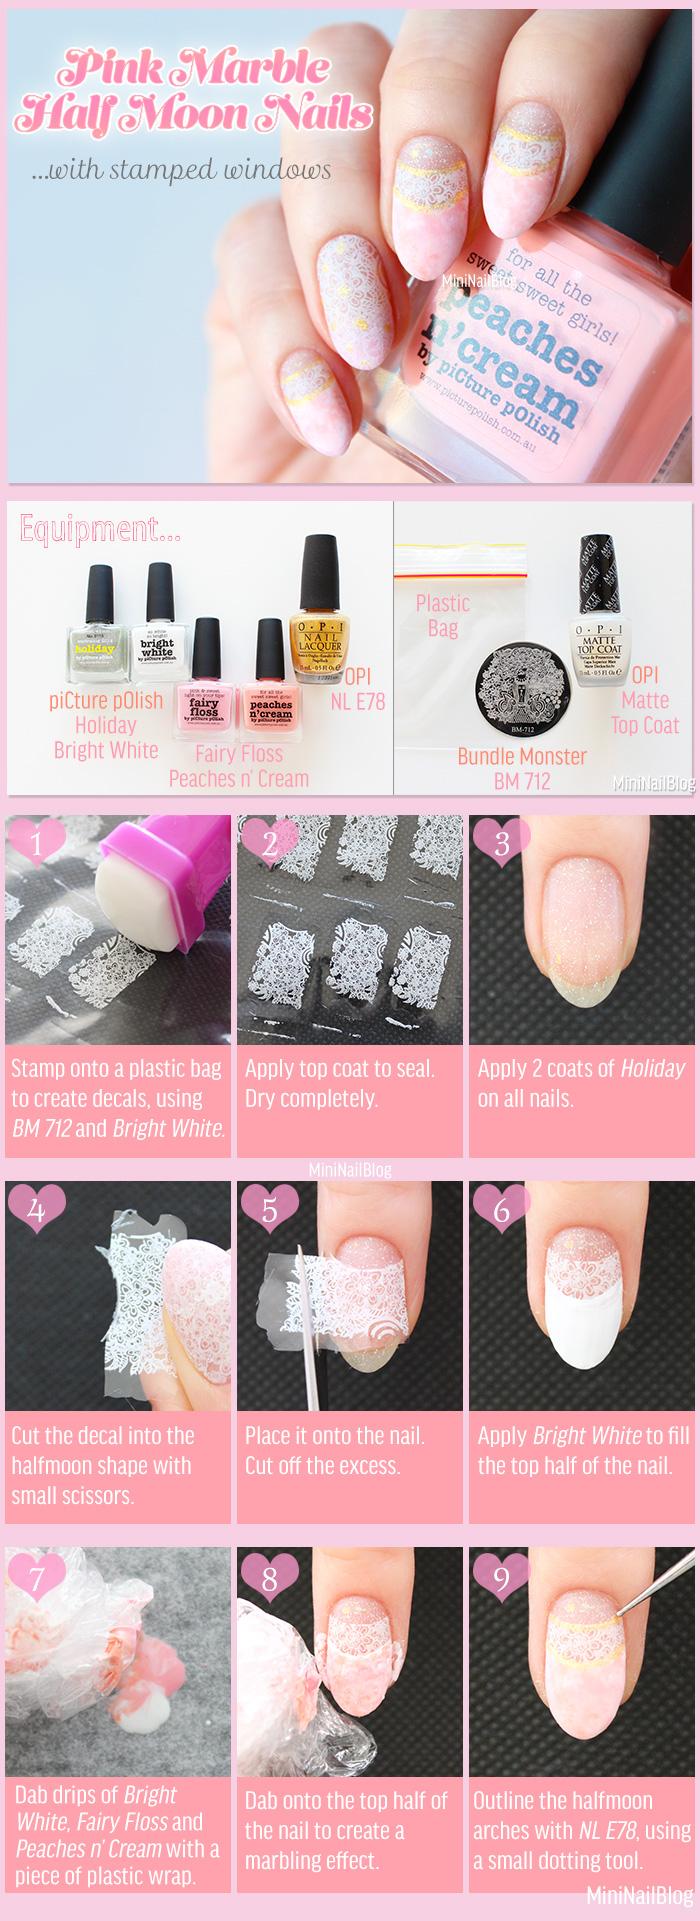 Pink Marble Half Moon Nails Tutorial